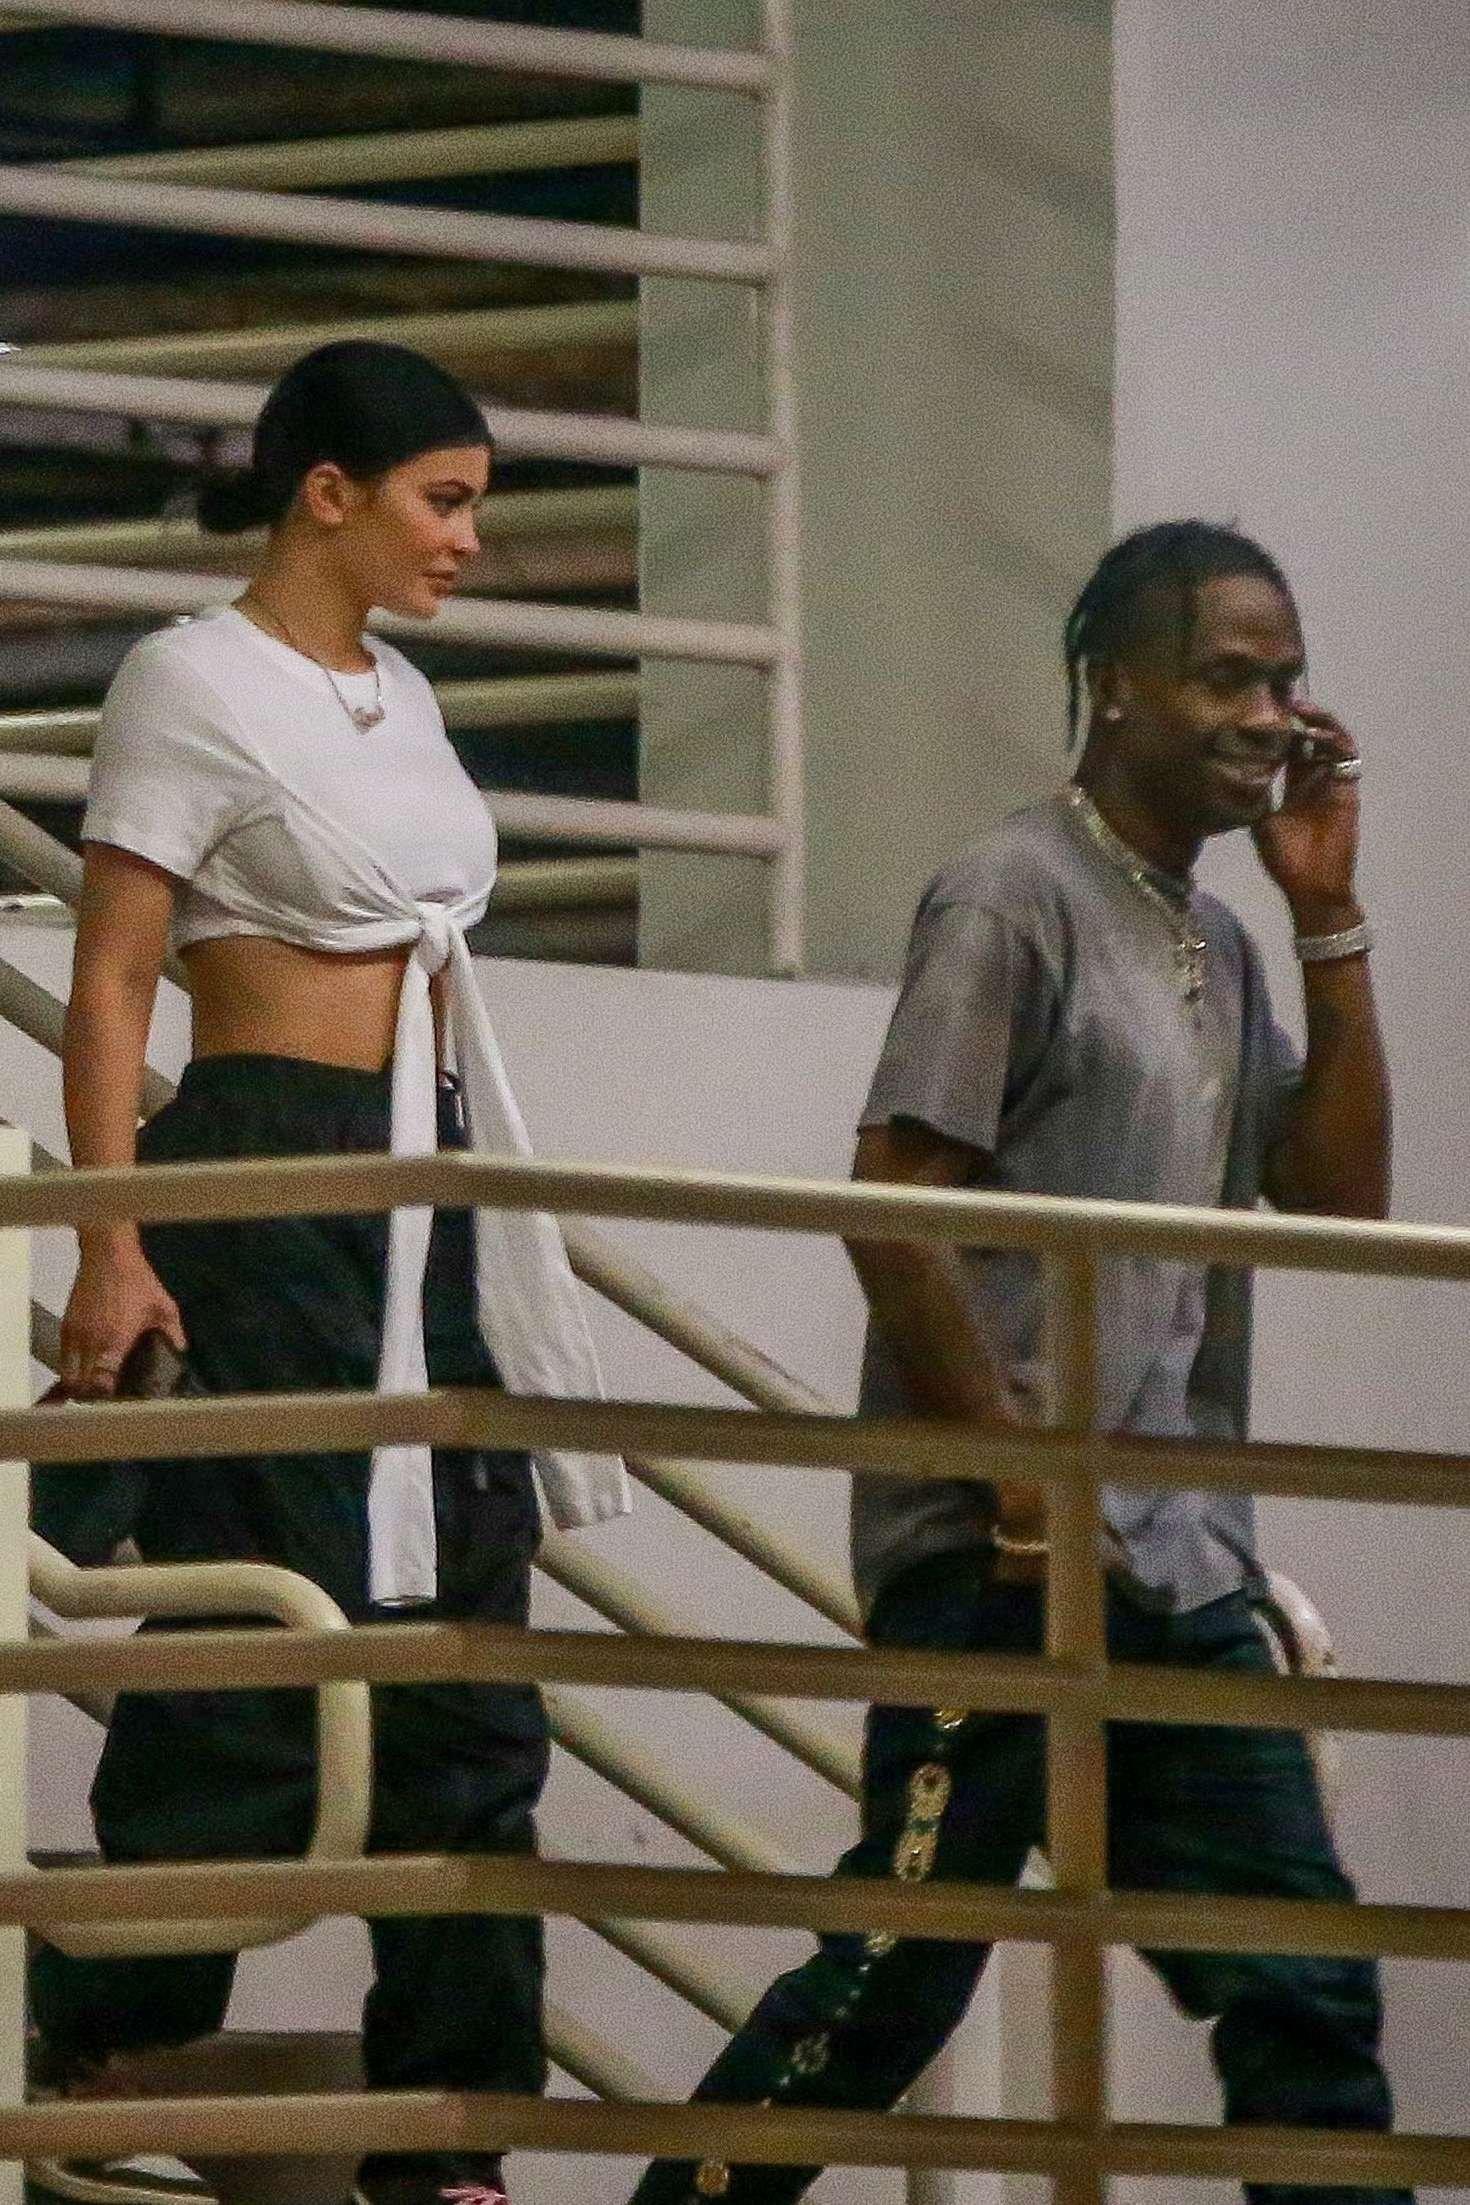 Kylie Jenner wearing black baggy sweatpants